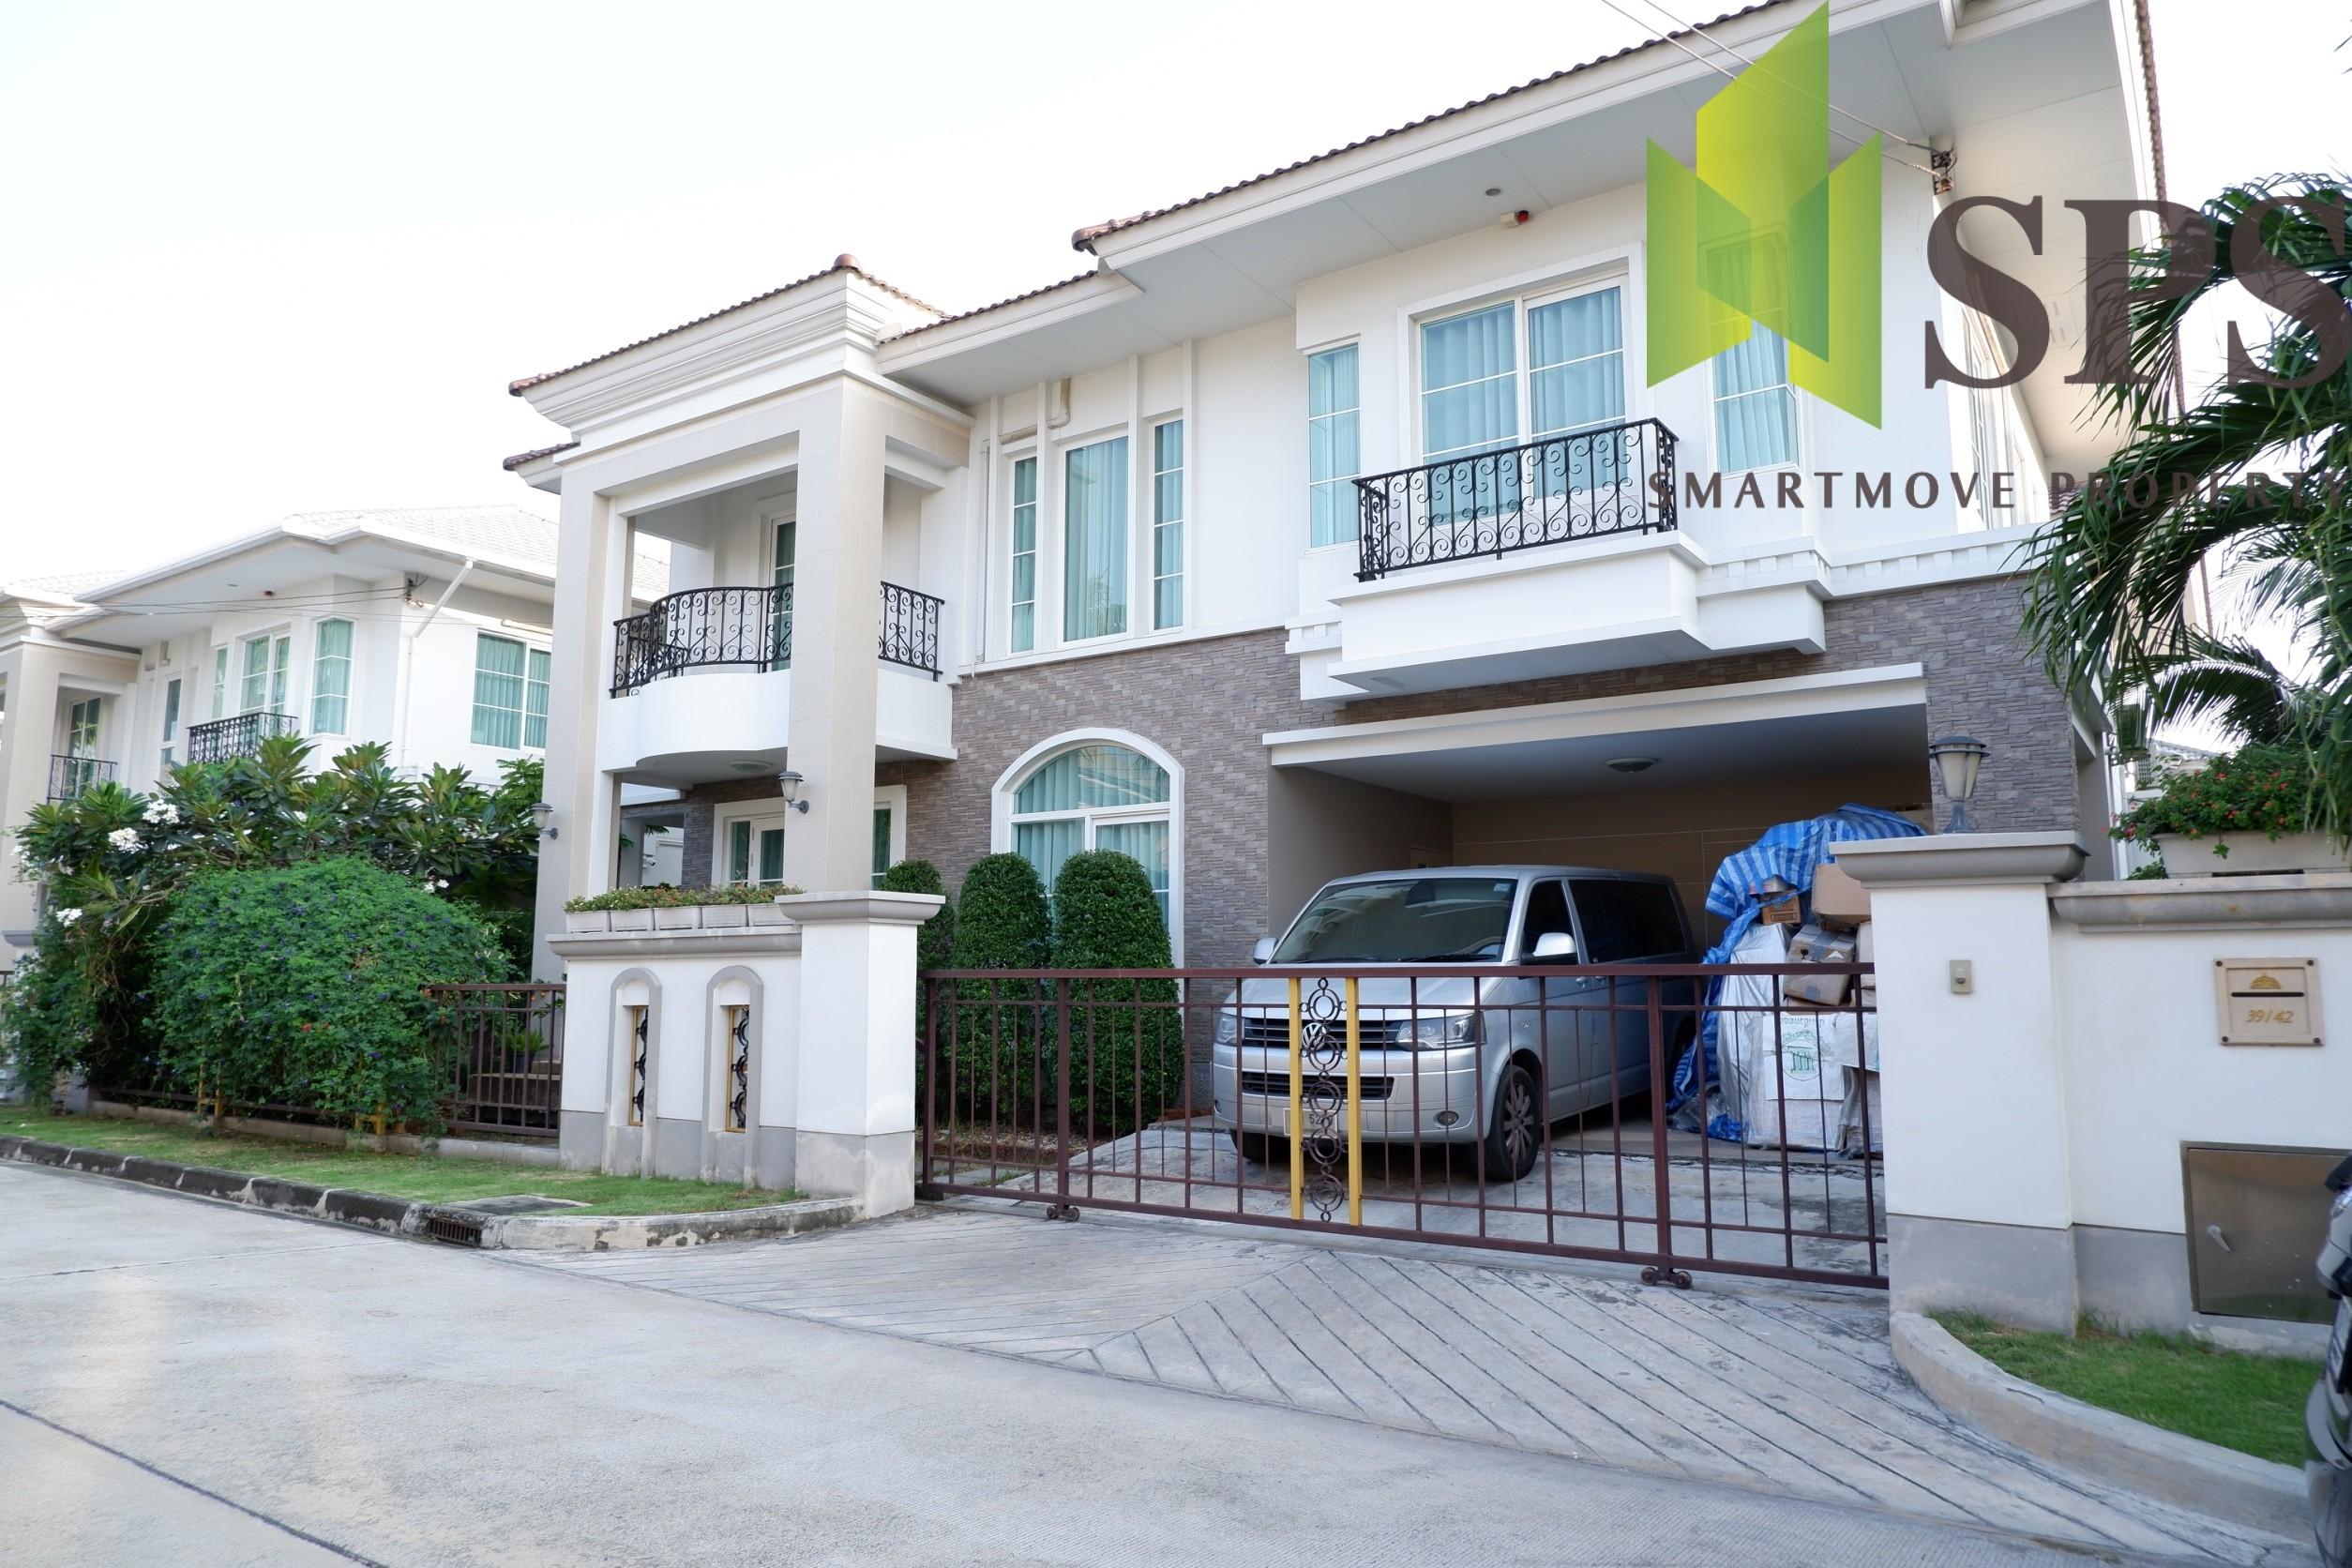 For Sale Single House Casa Premium(คาซ่าพรีเมี่ยม) อ่อนนุช-วงแหวน 3 beds 64.1 Sq.w ( SPS-GH222)